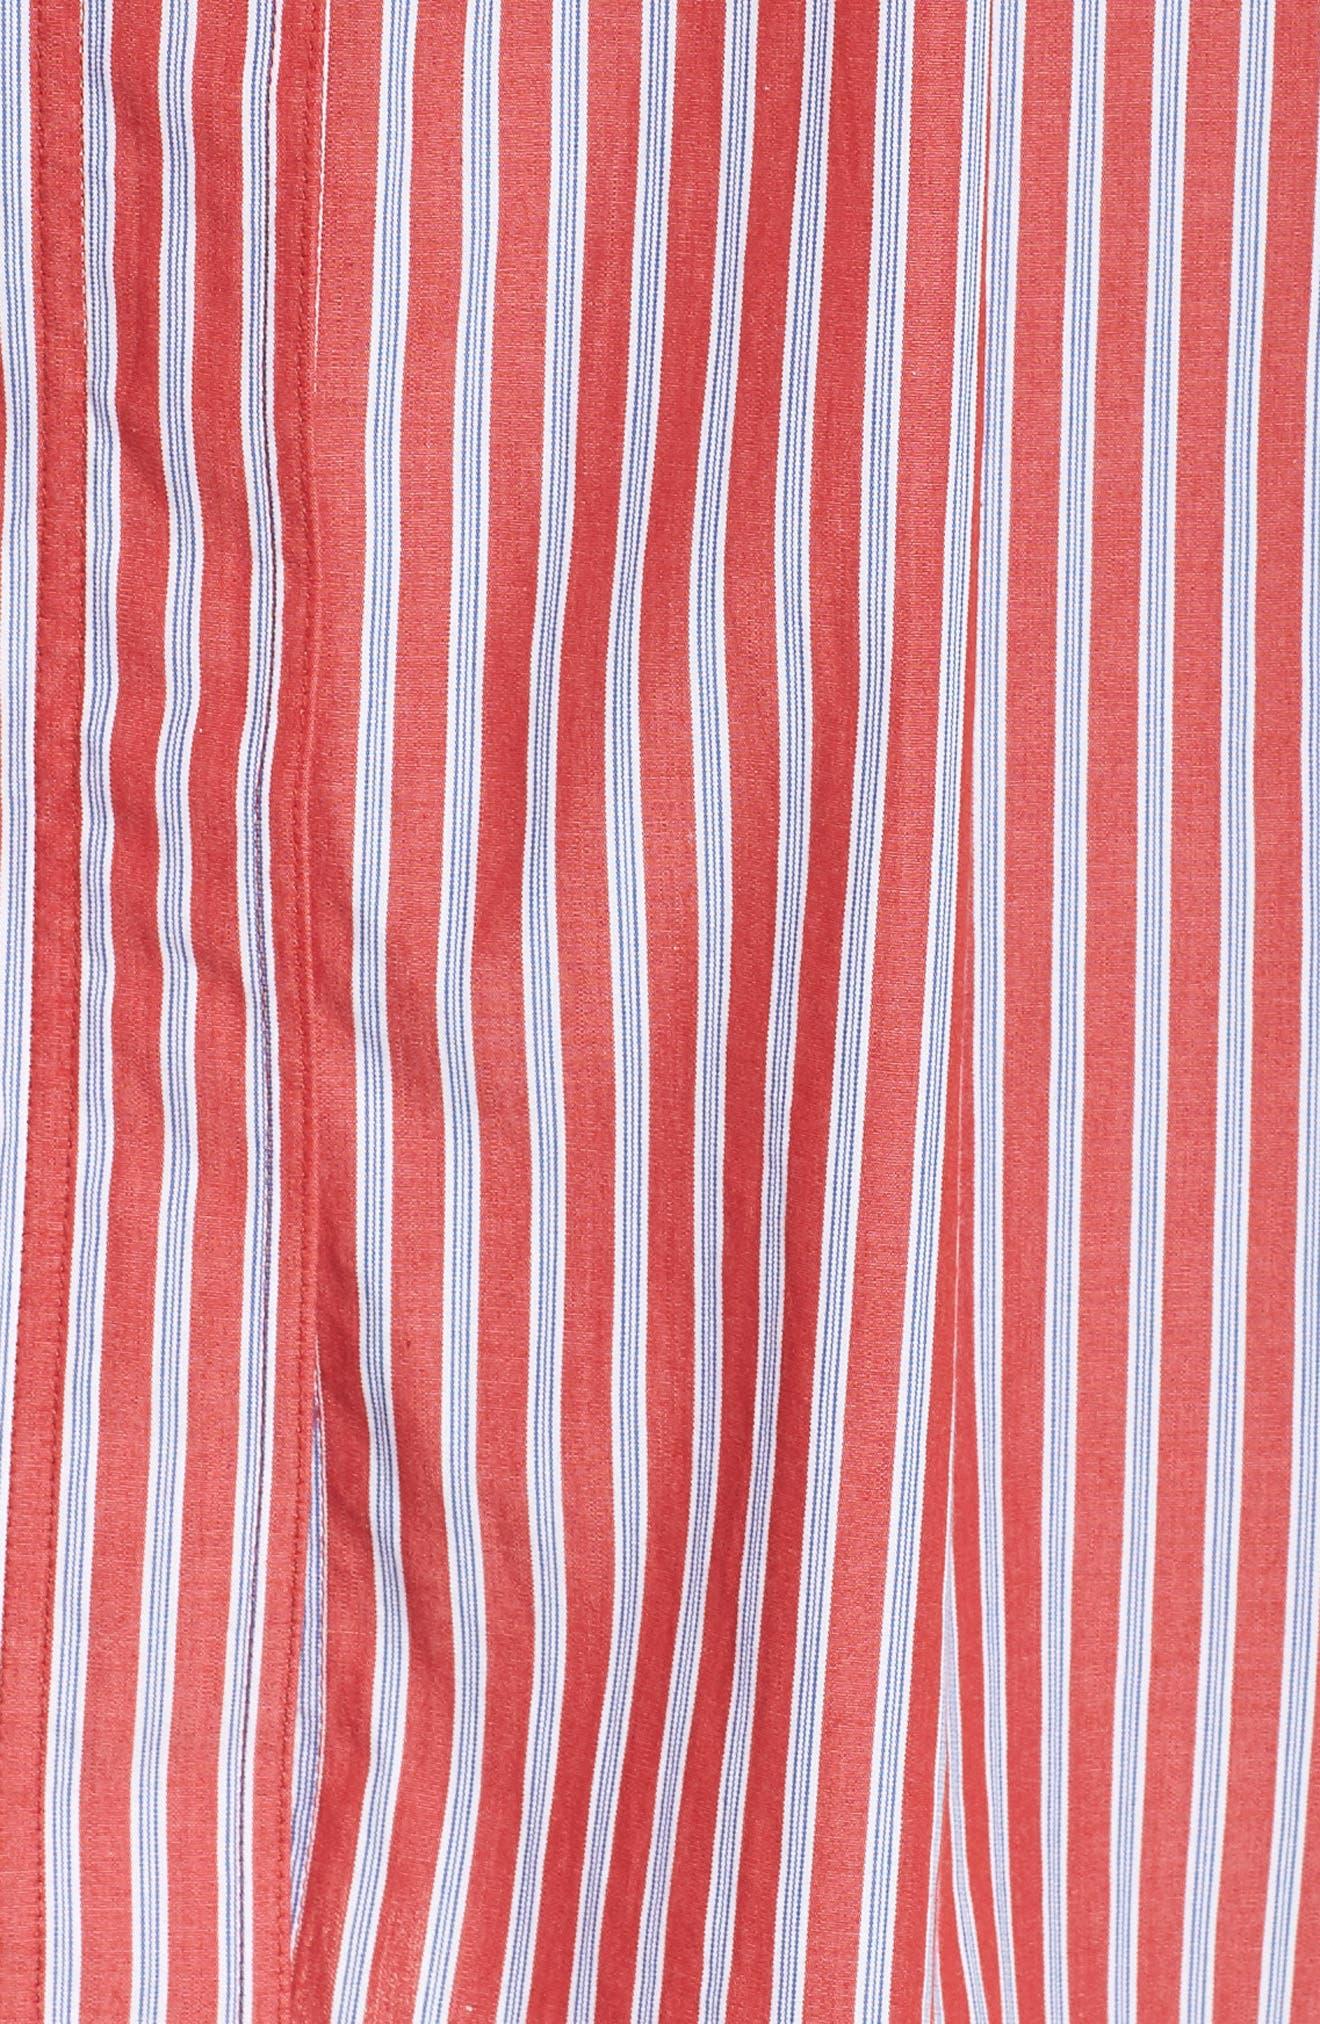 Stripe Tie Waist Shirtdress,                             Alternate thumbnail 6, color,                             600